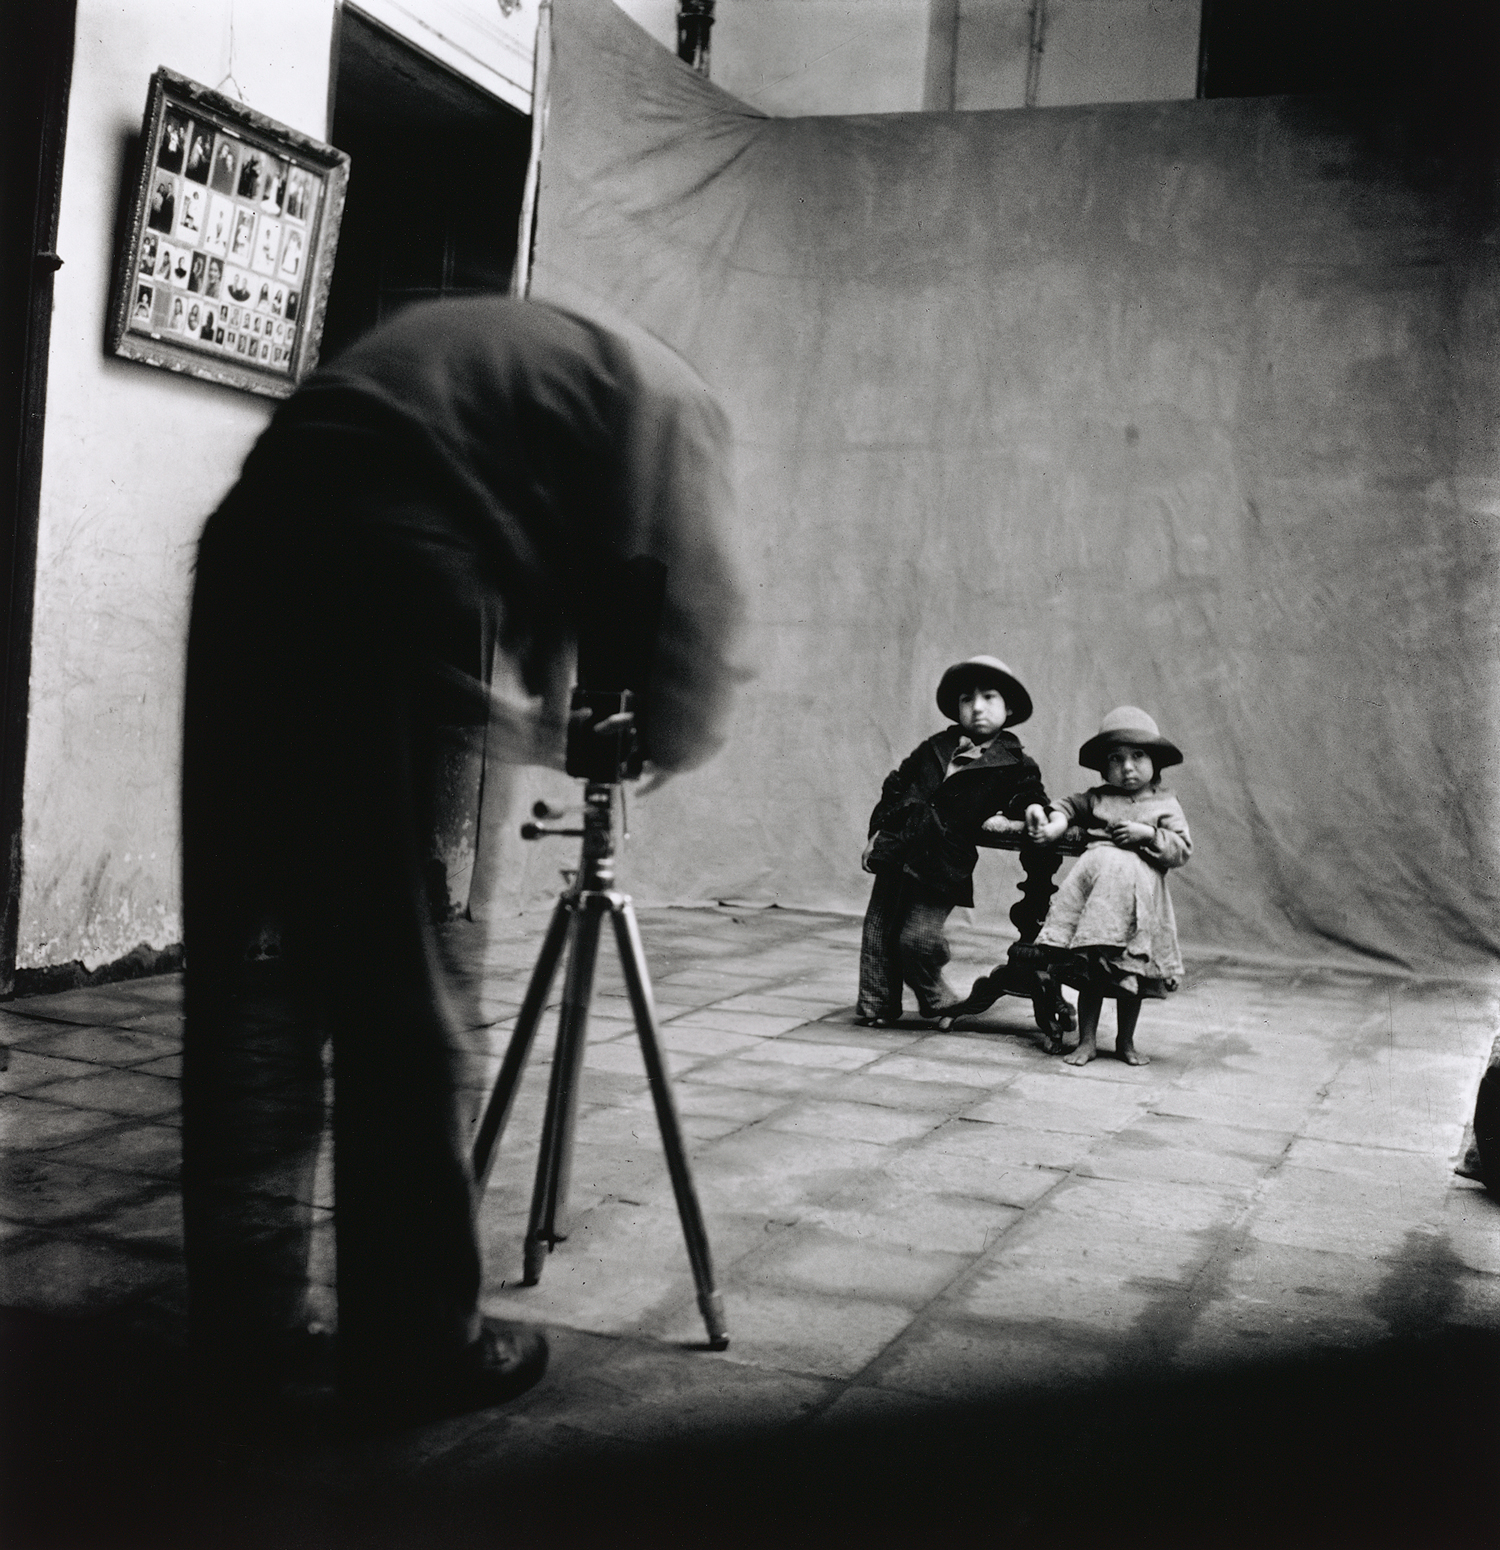 Fotographer Unknown, Circa 1948 Cuzco, Peru (c) The Irving Penn Foundation